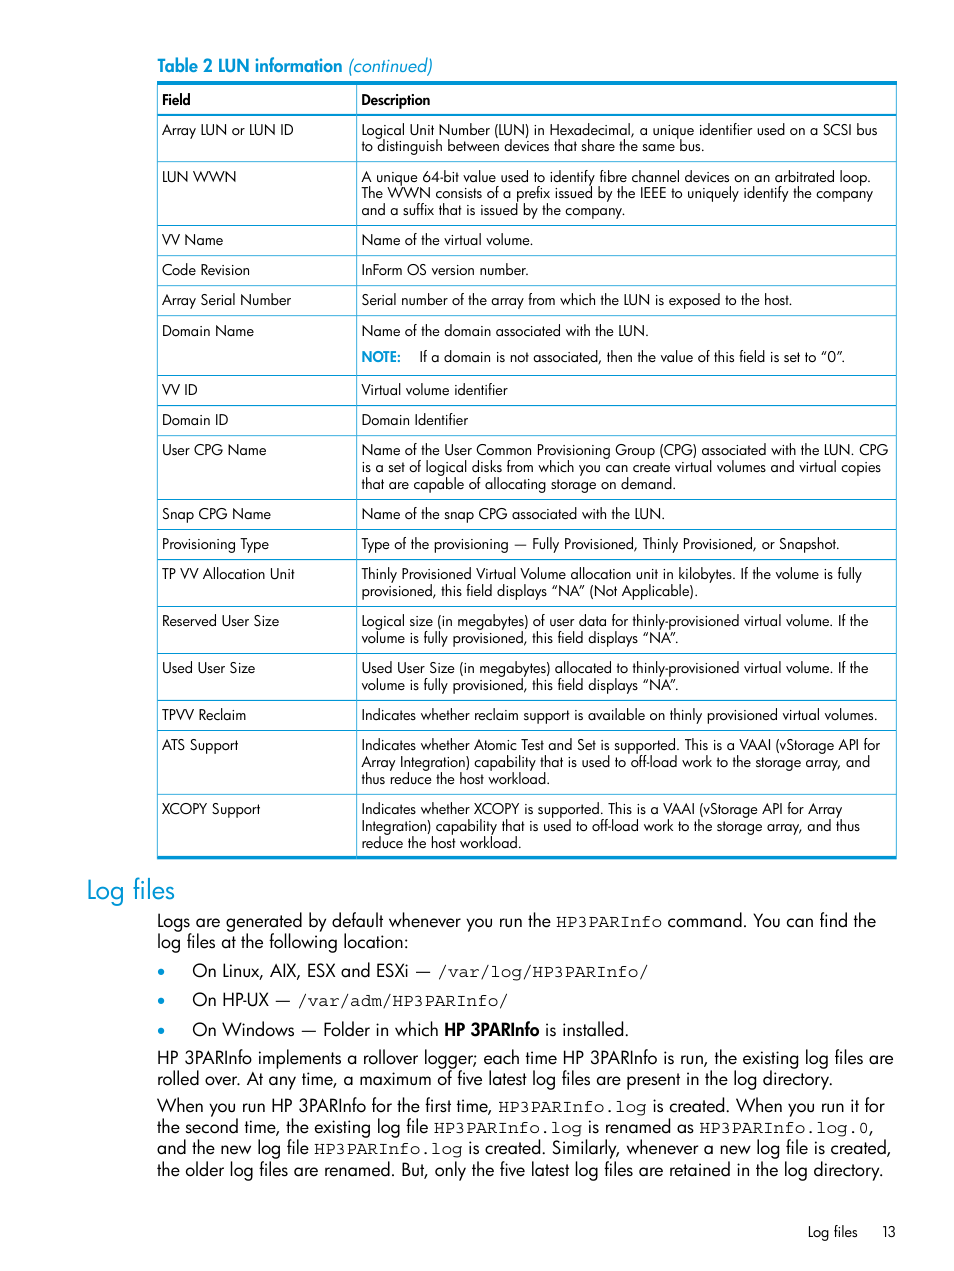 Log files | HP 3PAR System Reporter Software User Manual | Page 13